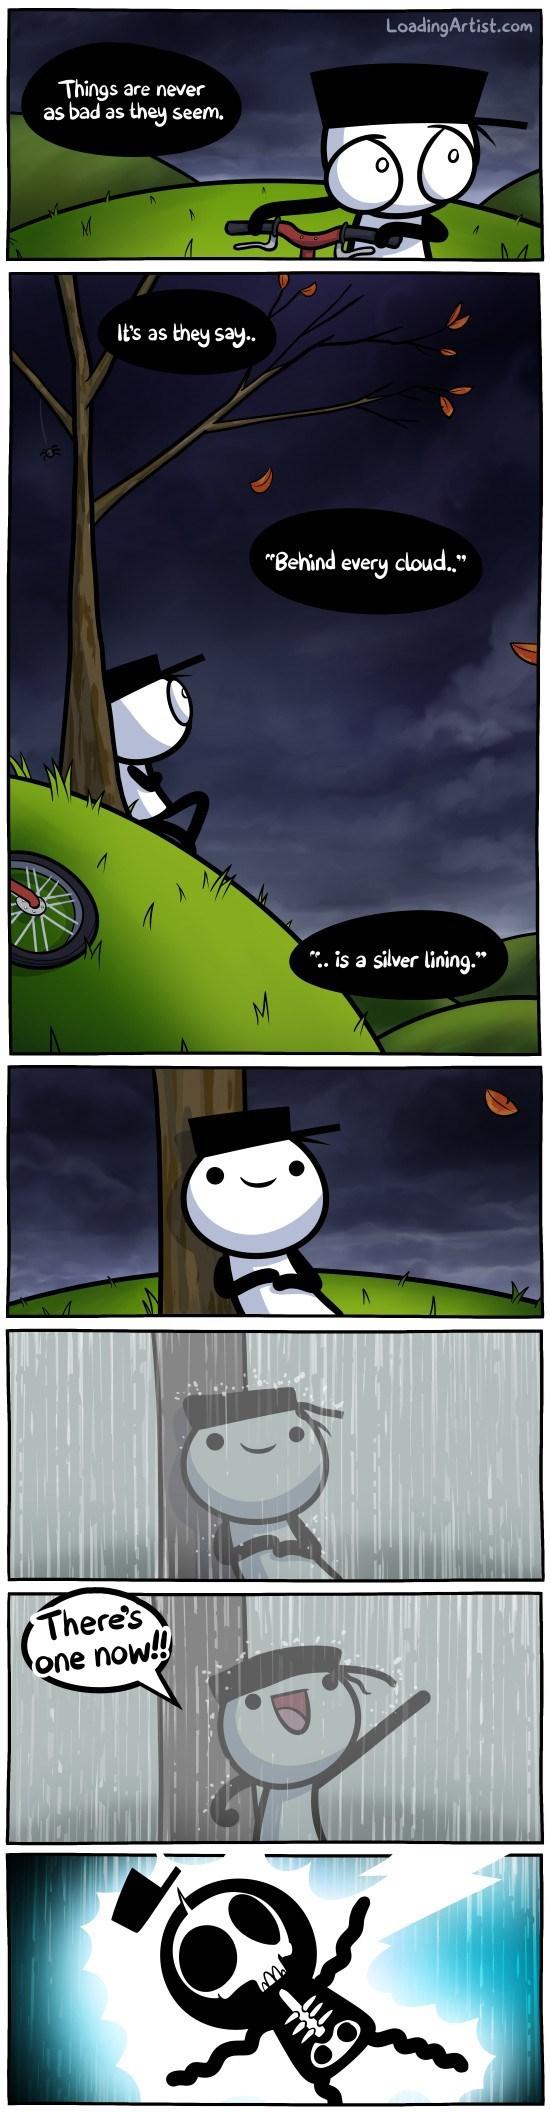 web comics optimism This Silver Lining Hurts